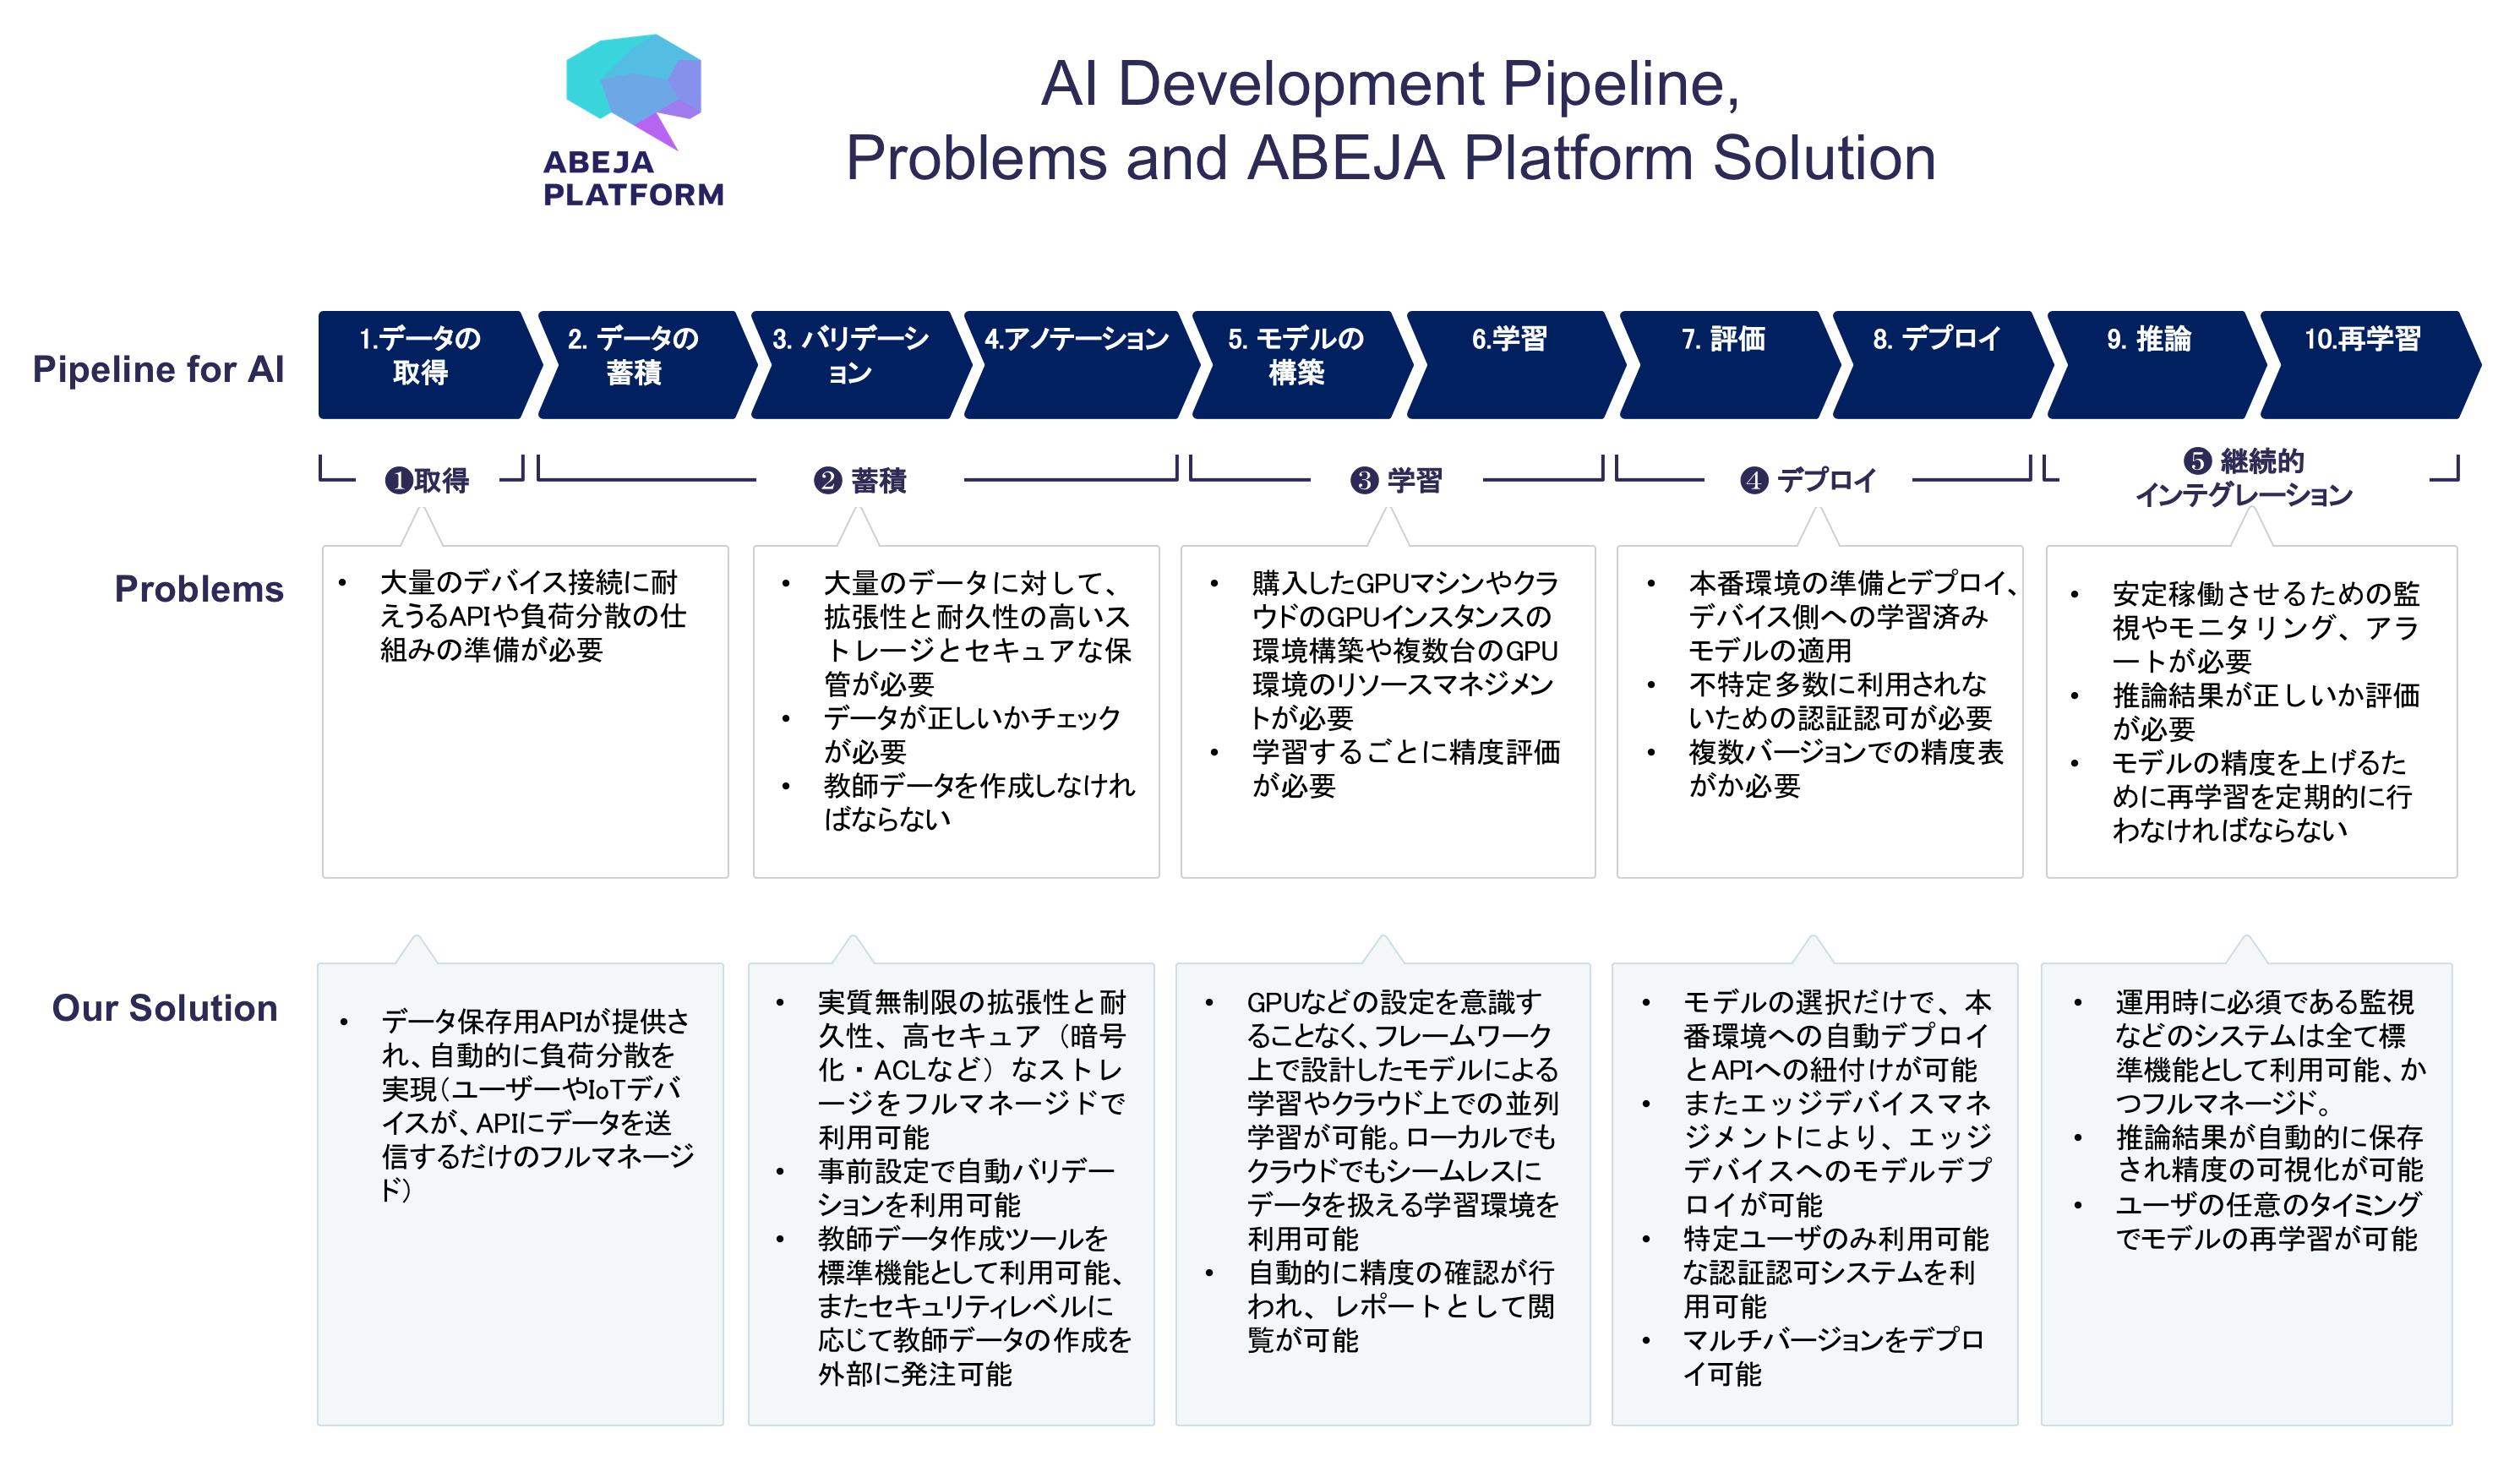 https://developers.abeja.io/images/abeja_platform_ai_development_pipeline.png